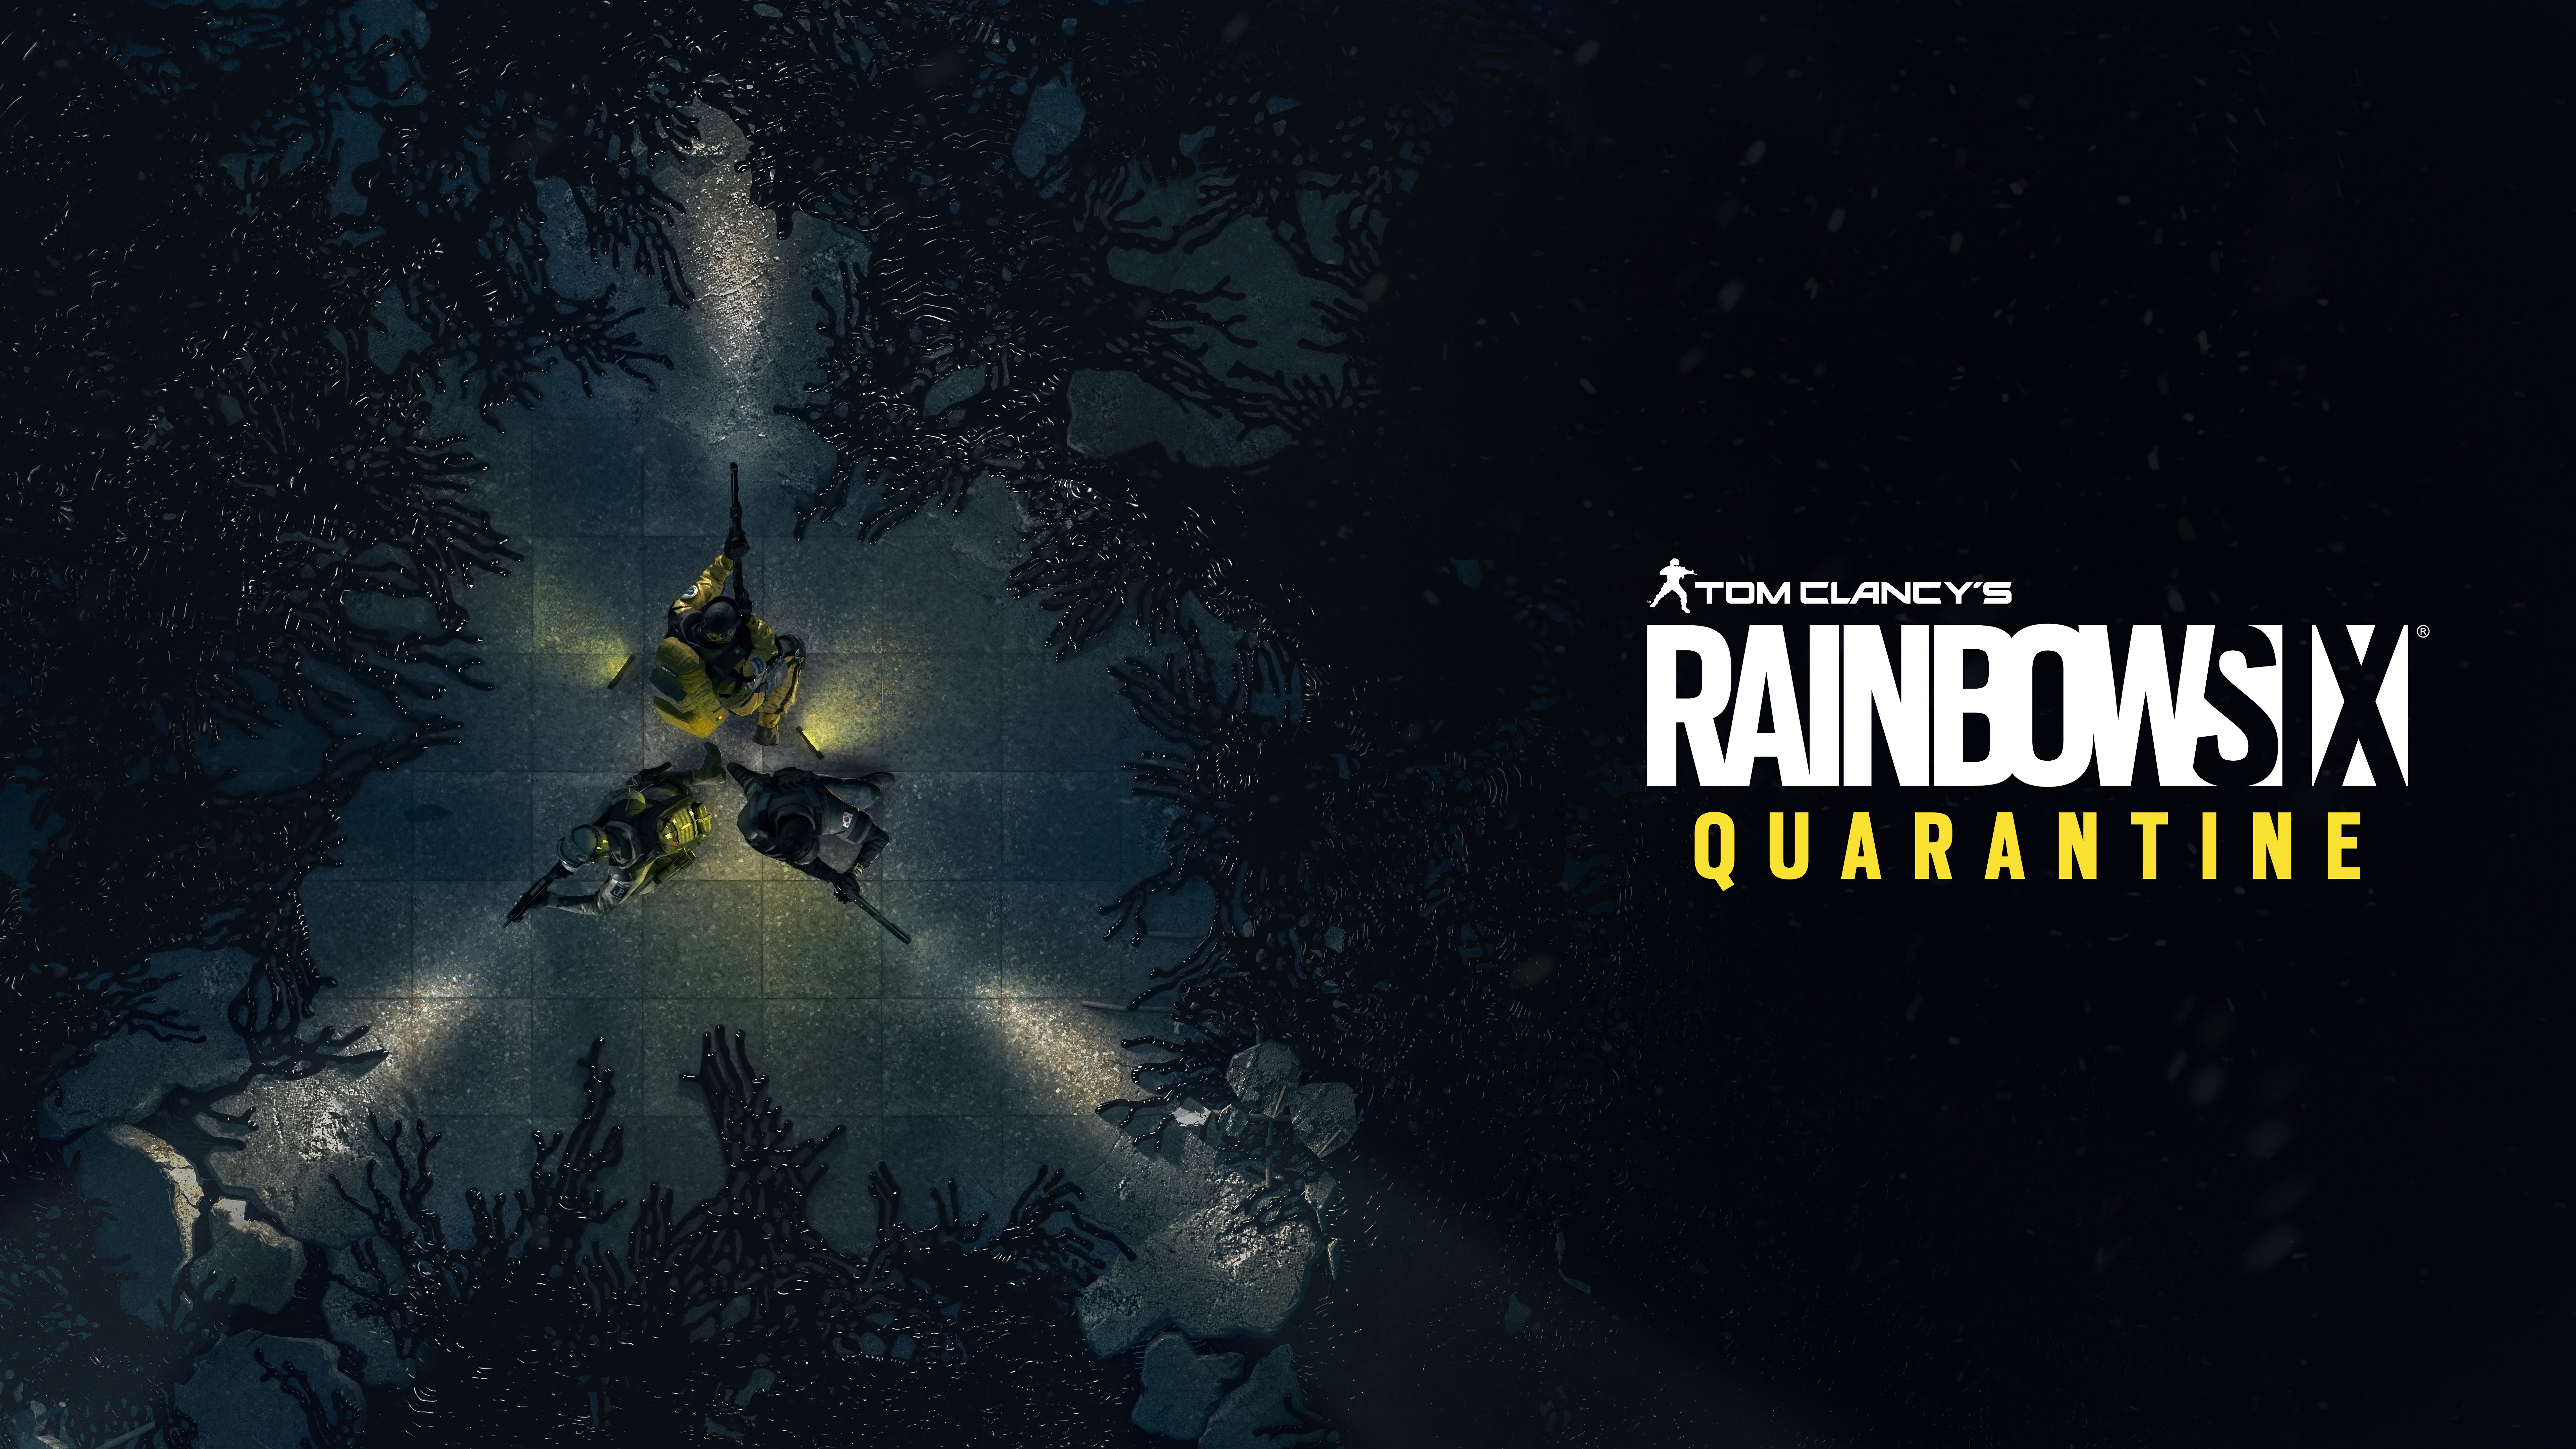 Fondos de pantalla Rainbow Six Quarantine